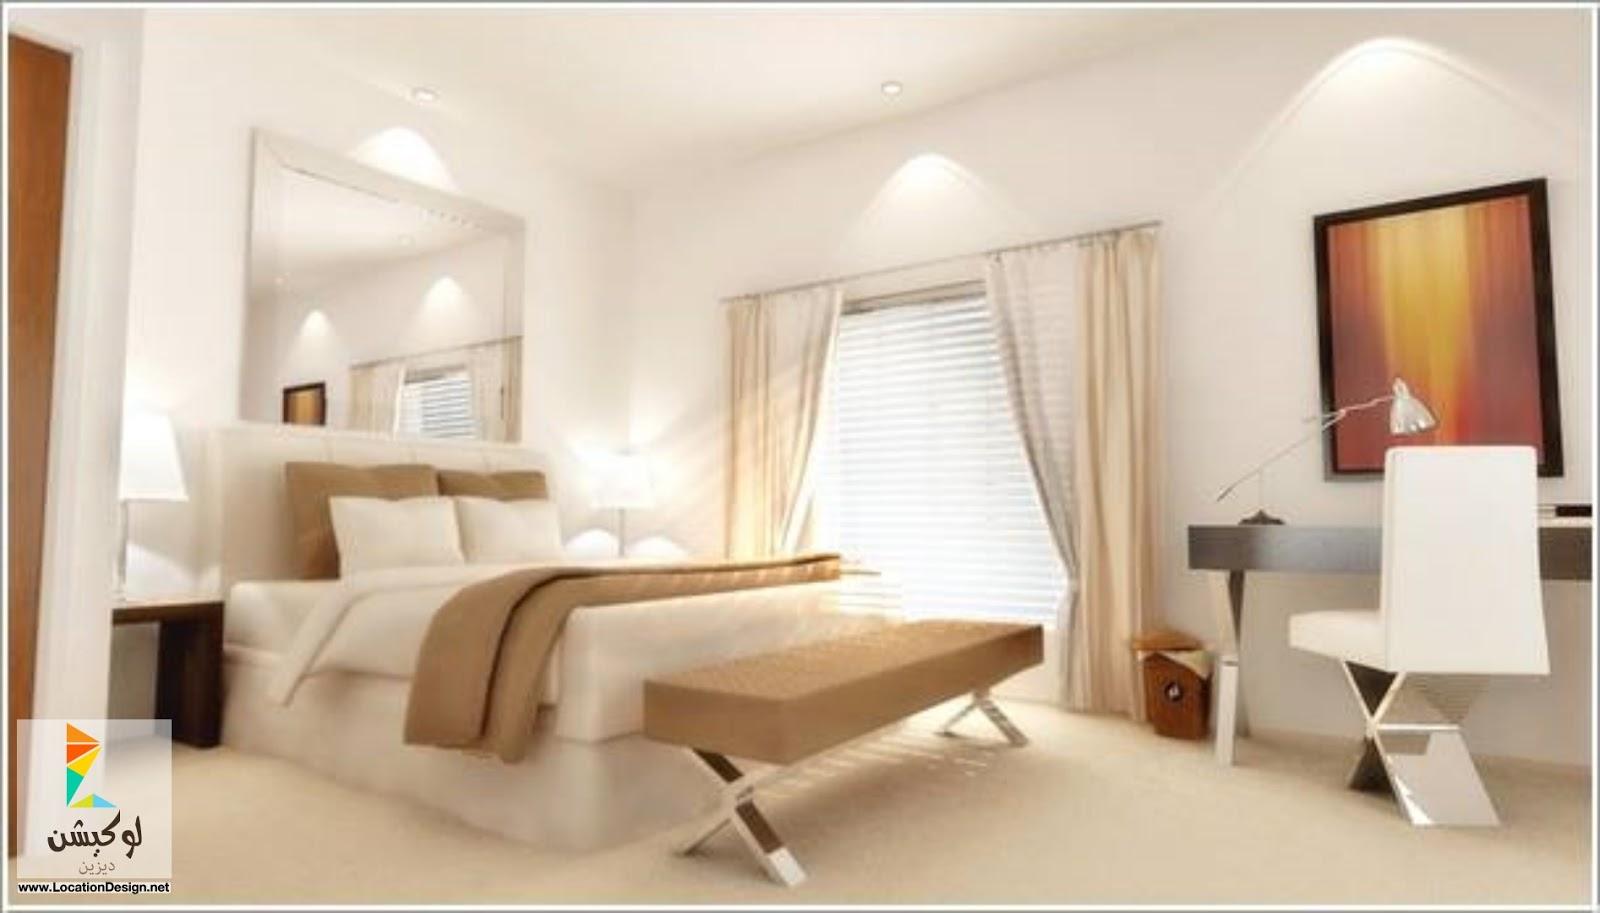 غرف نوم مودرن ديكورات غرف نوم صور غرف نوم 2020 21